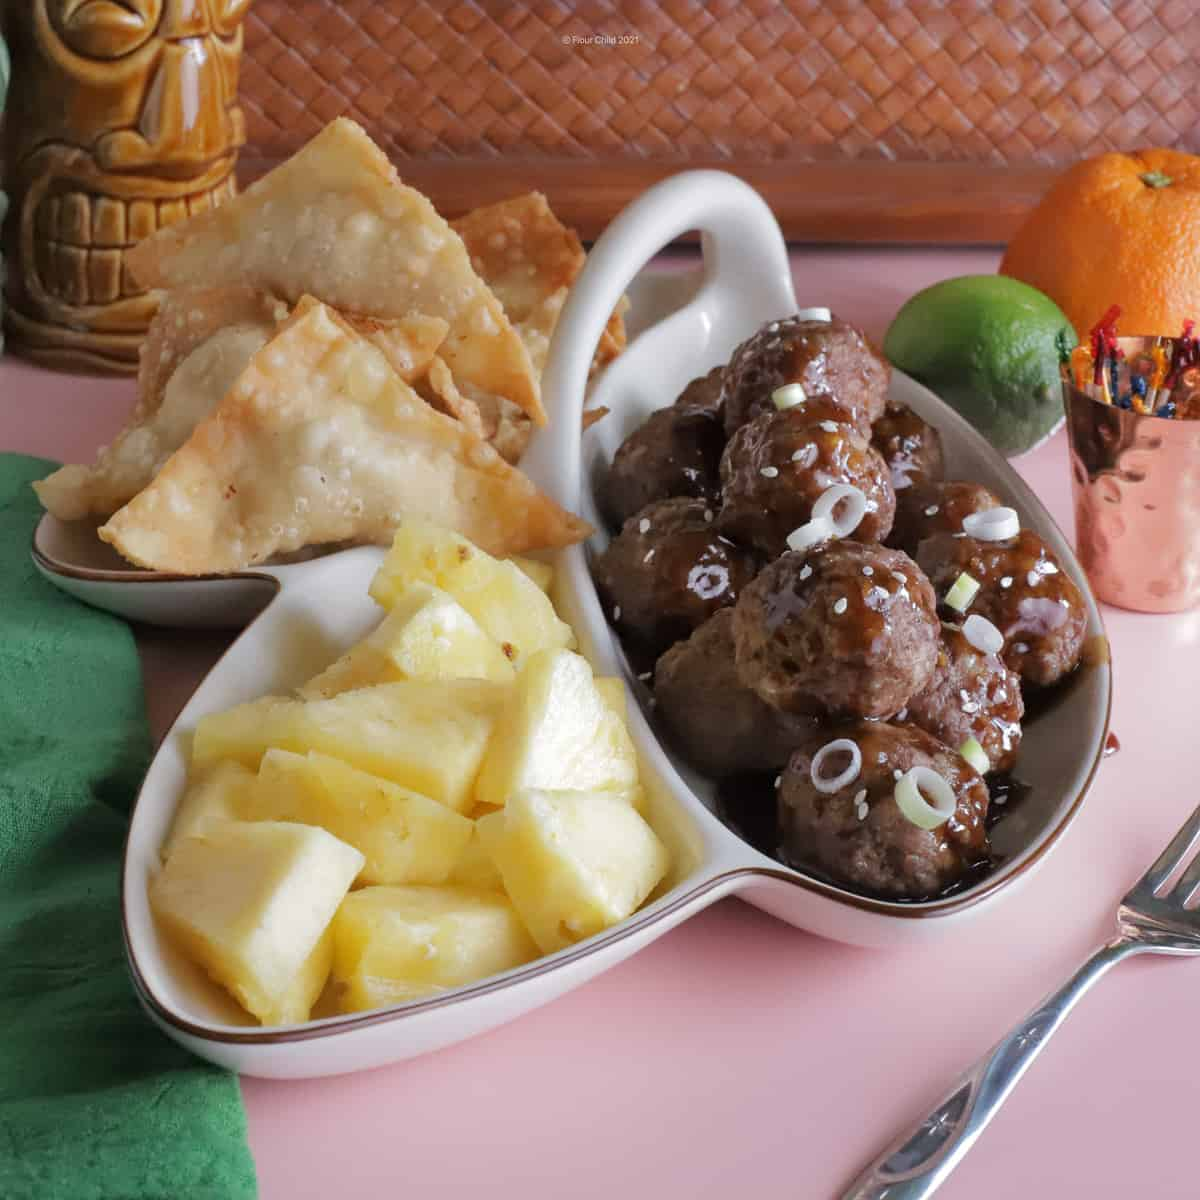 Divided 3-way pupu platter tray with crab rangoon, teriyaki meatballs, and fresh pineapple chunks